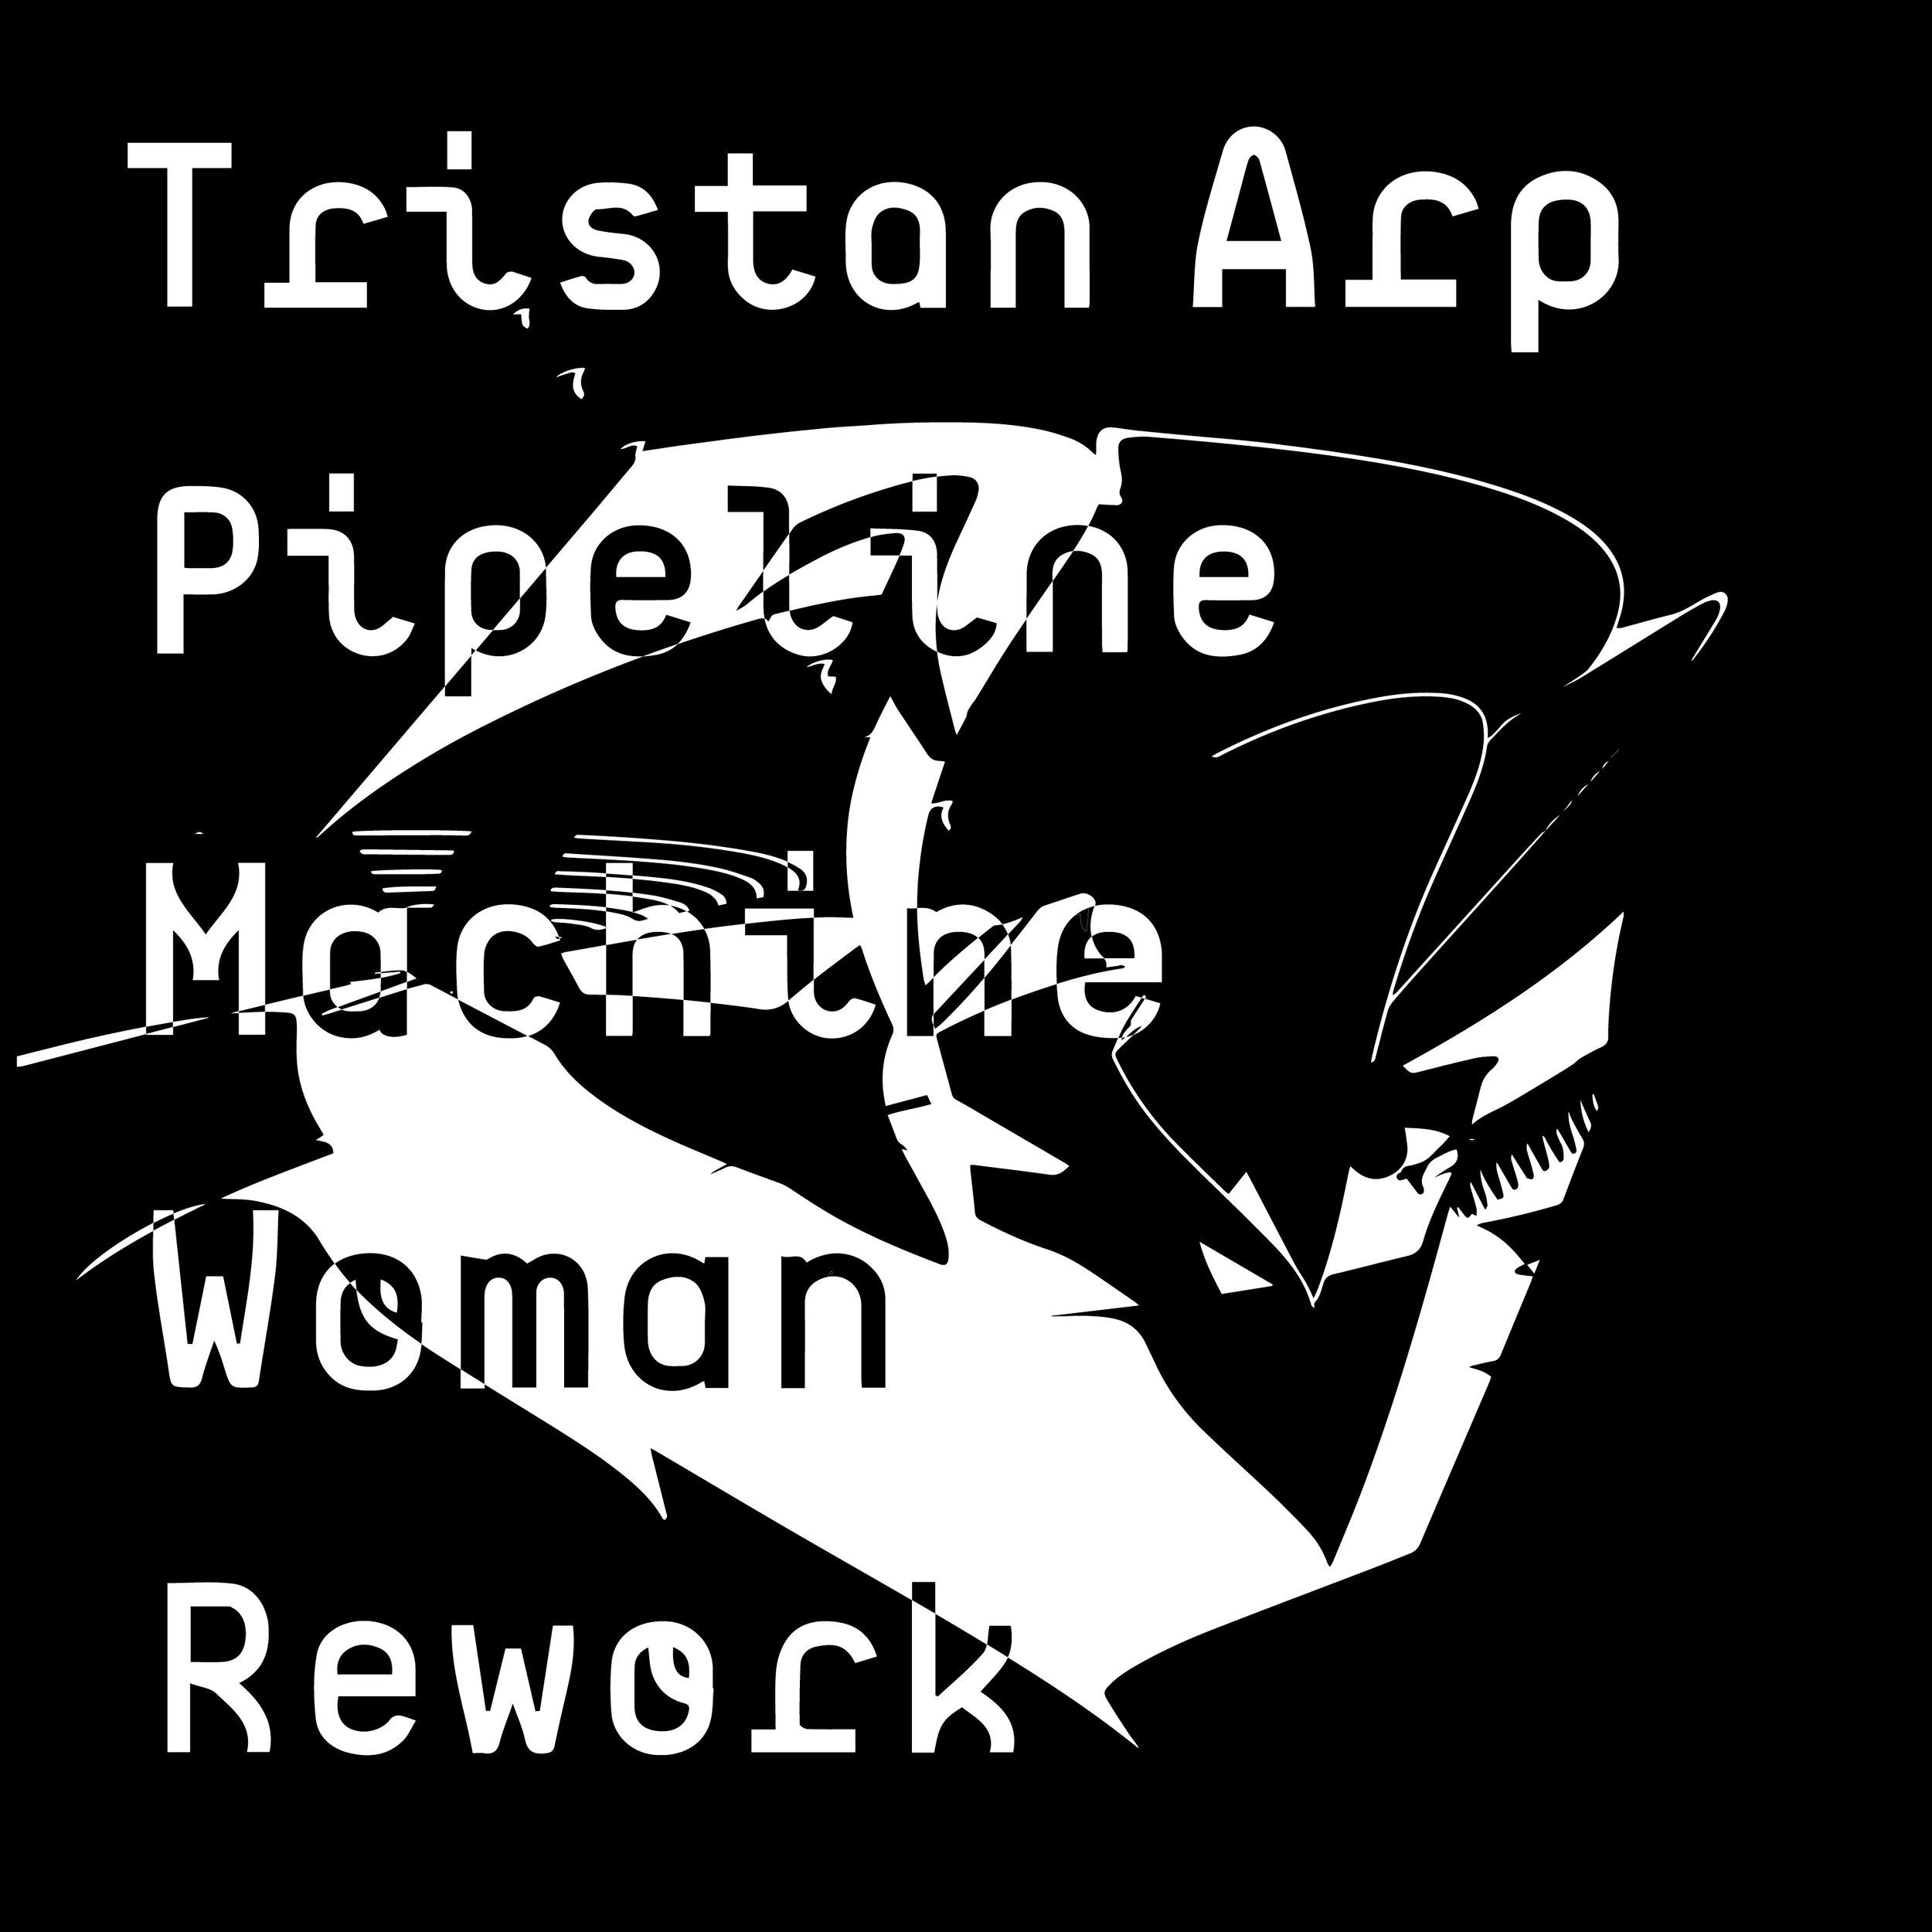 Pipeline (Machine Woman Rework).jpeg